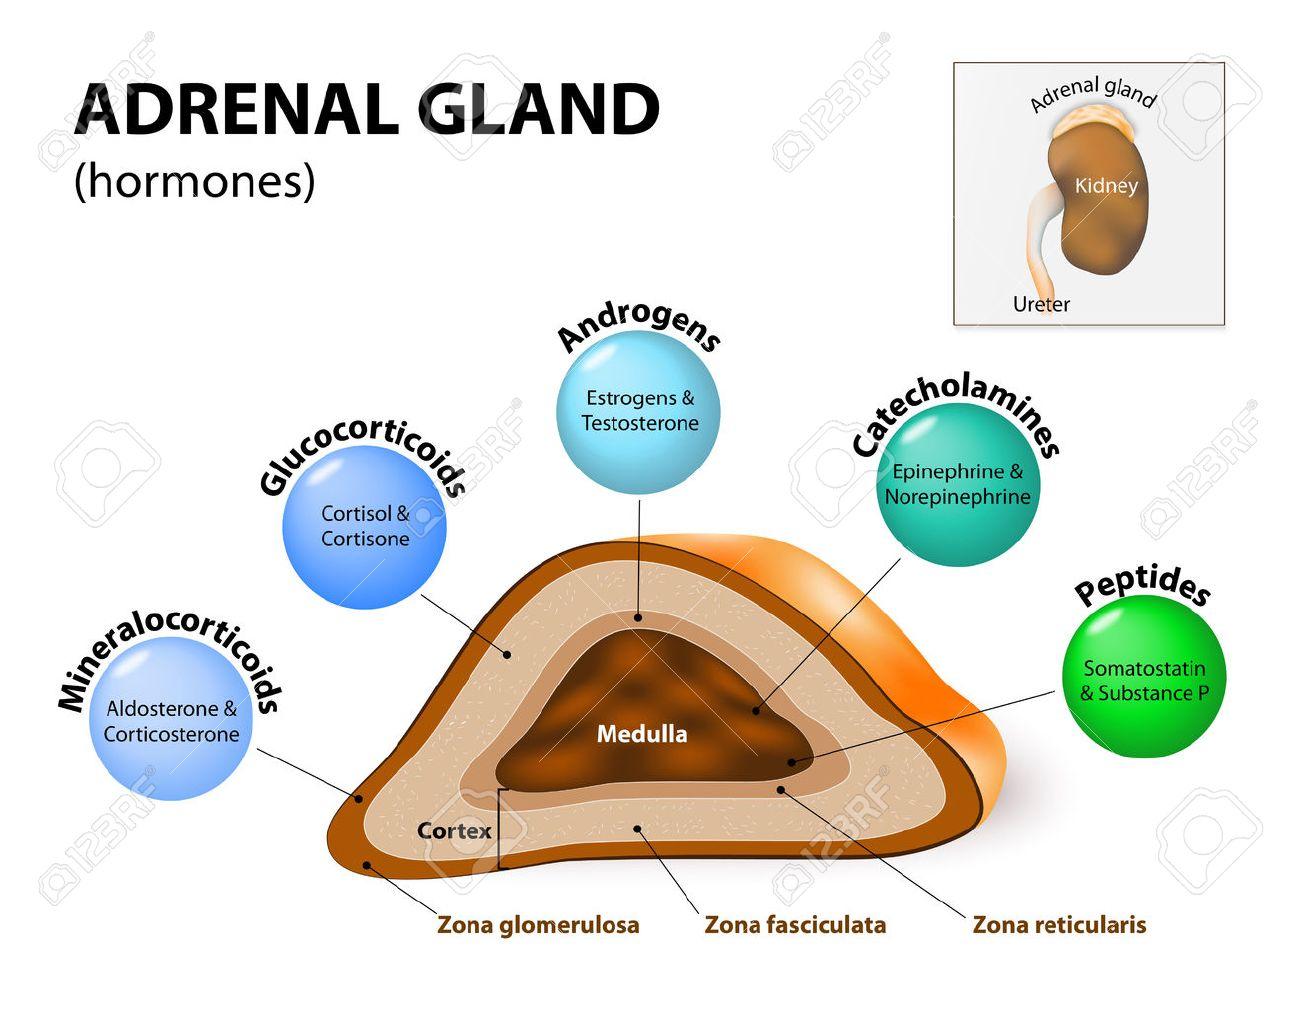 Adrenal Gland Hormone Secretion Adrenal Glands Sit Atop The